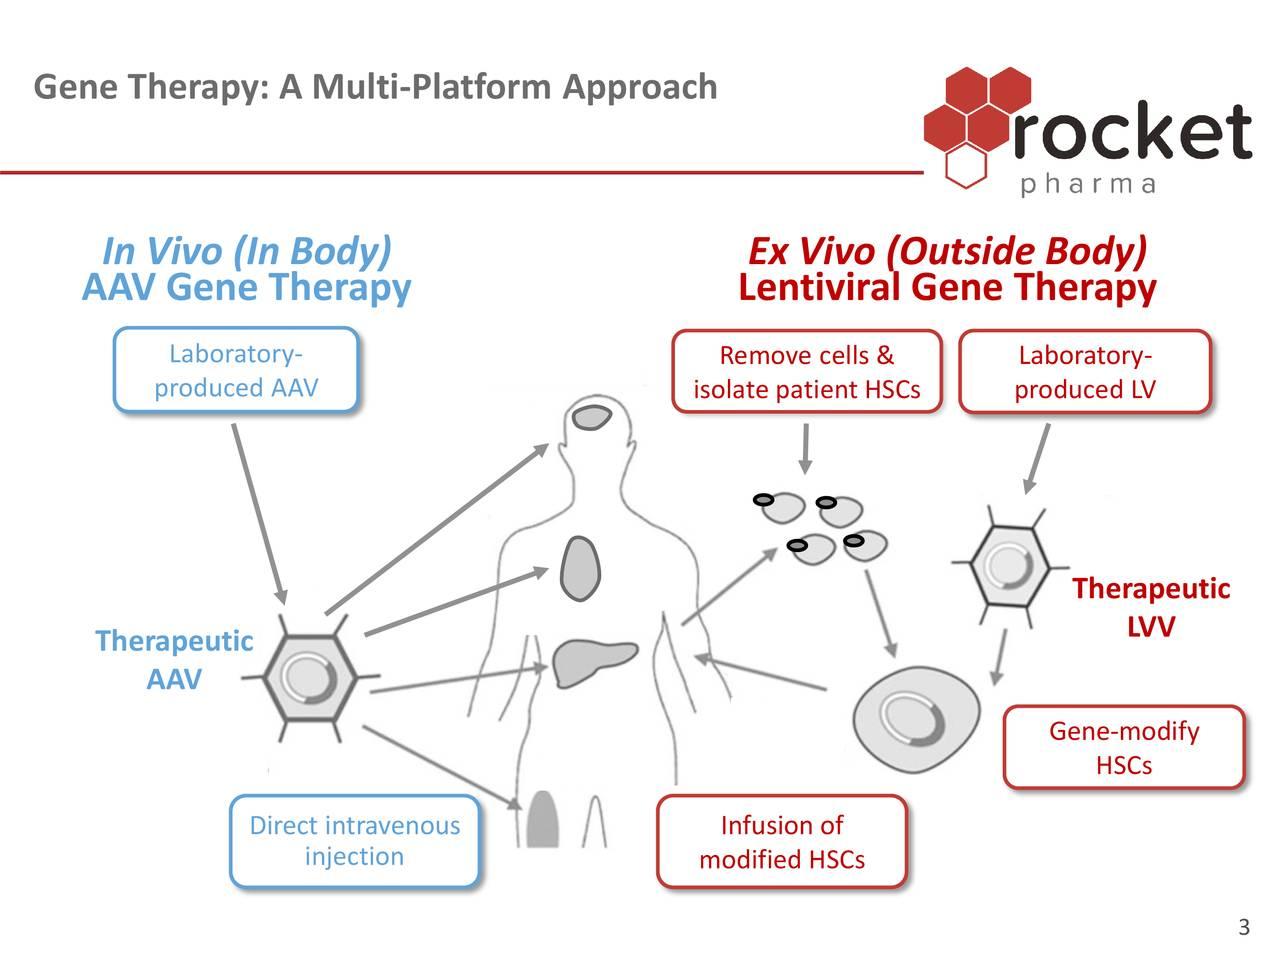 Gene Therapy: A Multi-Platform Approach